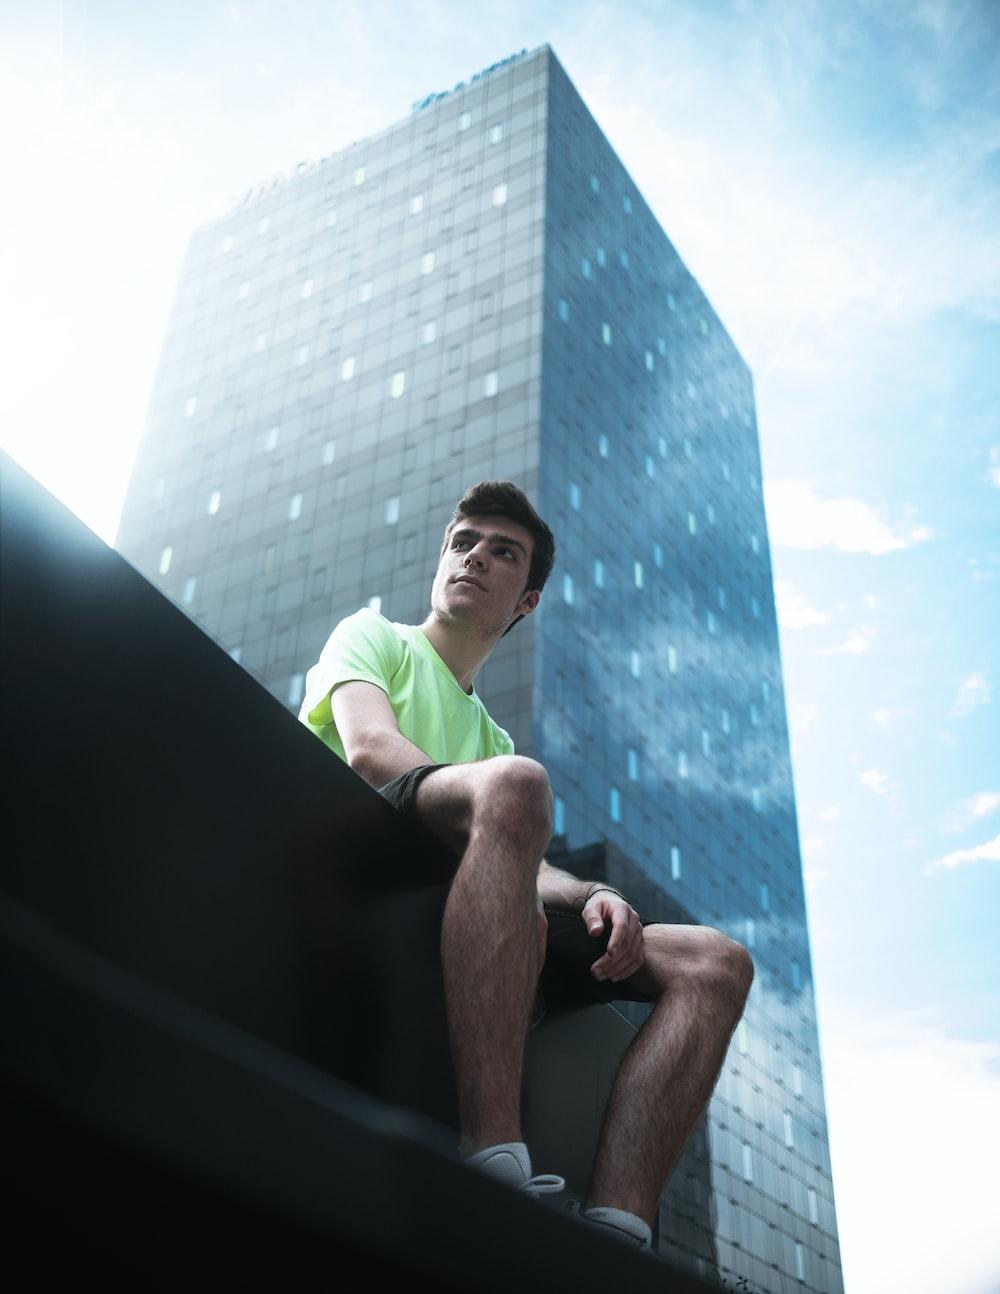 man in green t-shirt sitting on black concrete wall